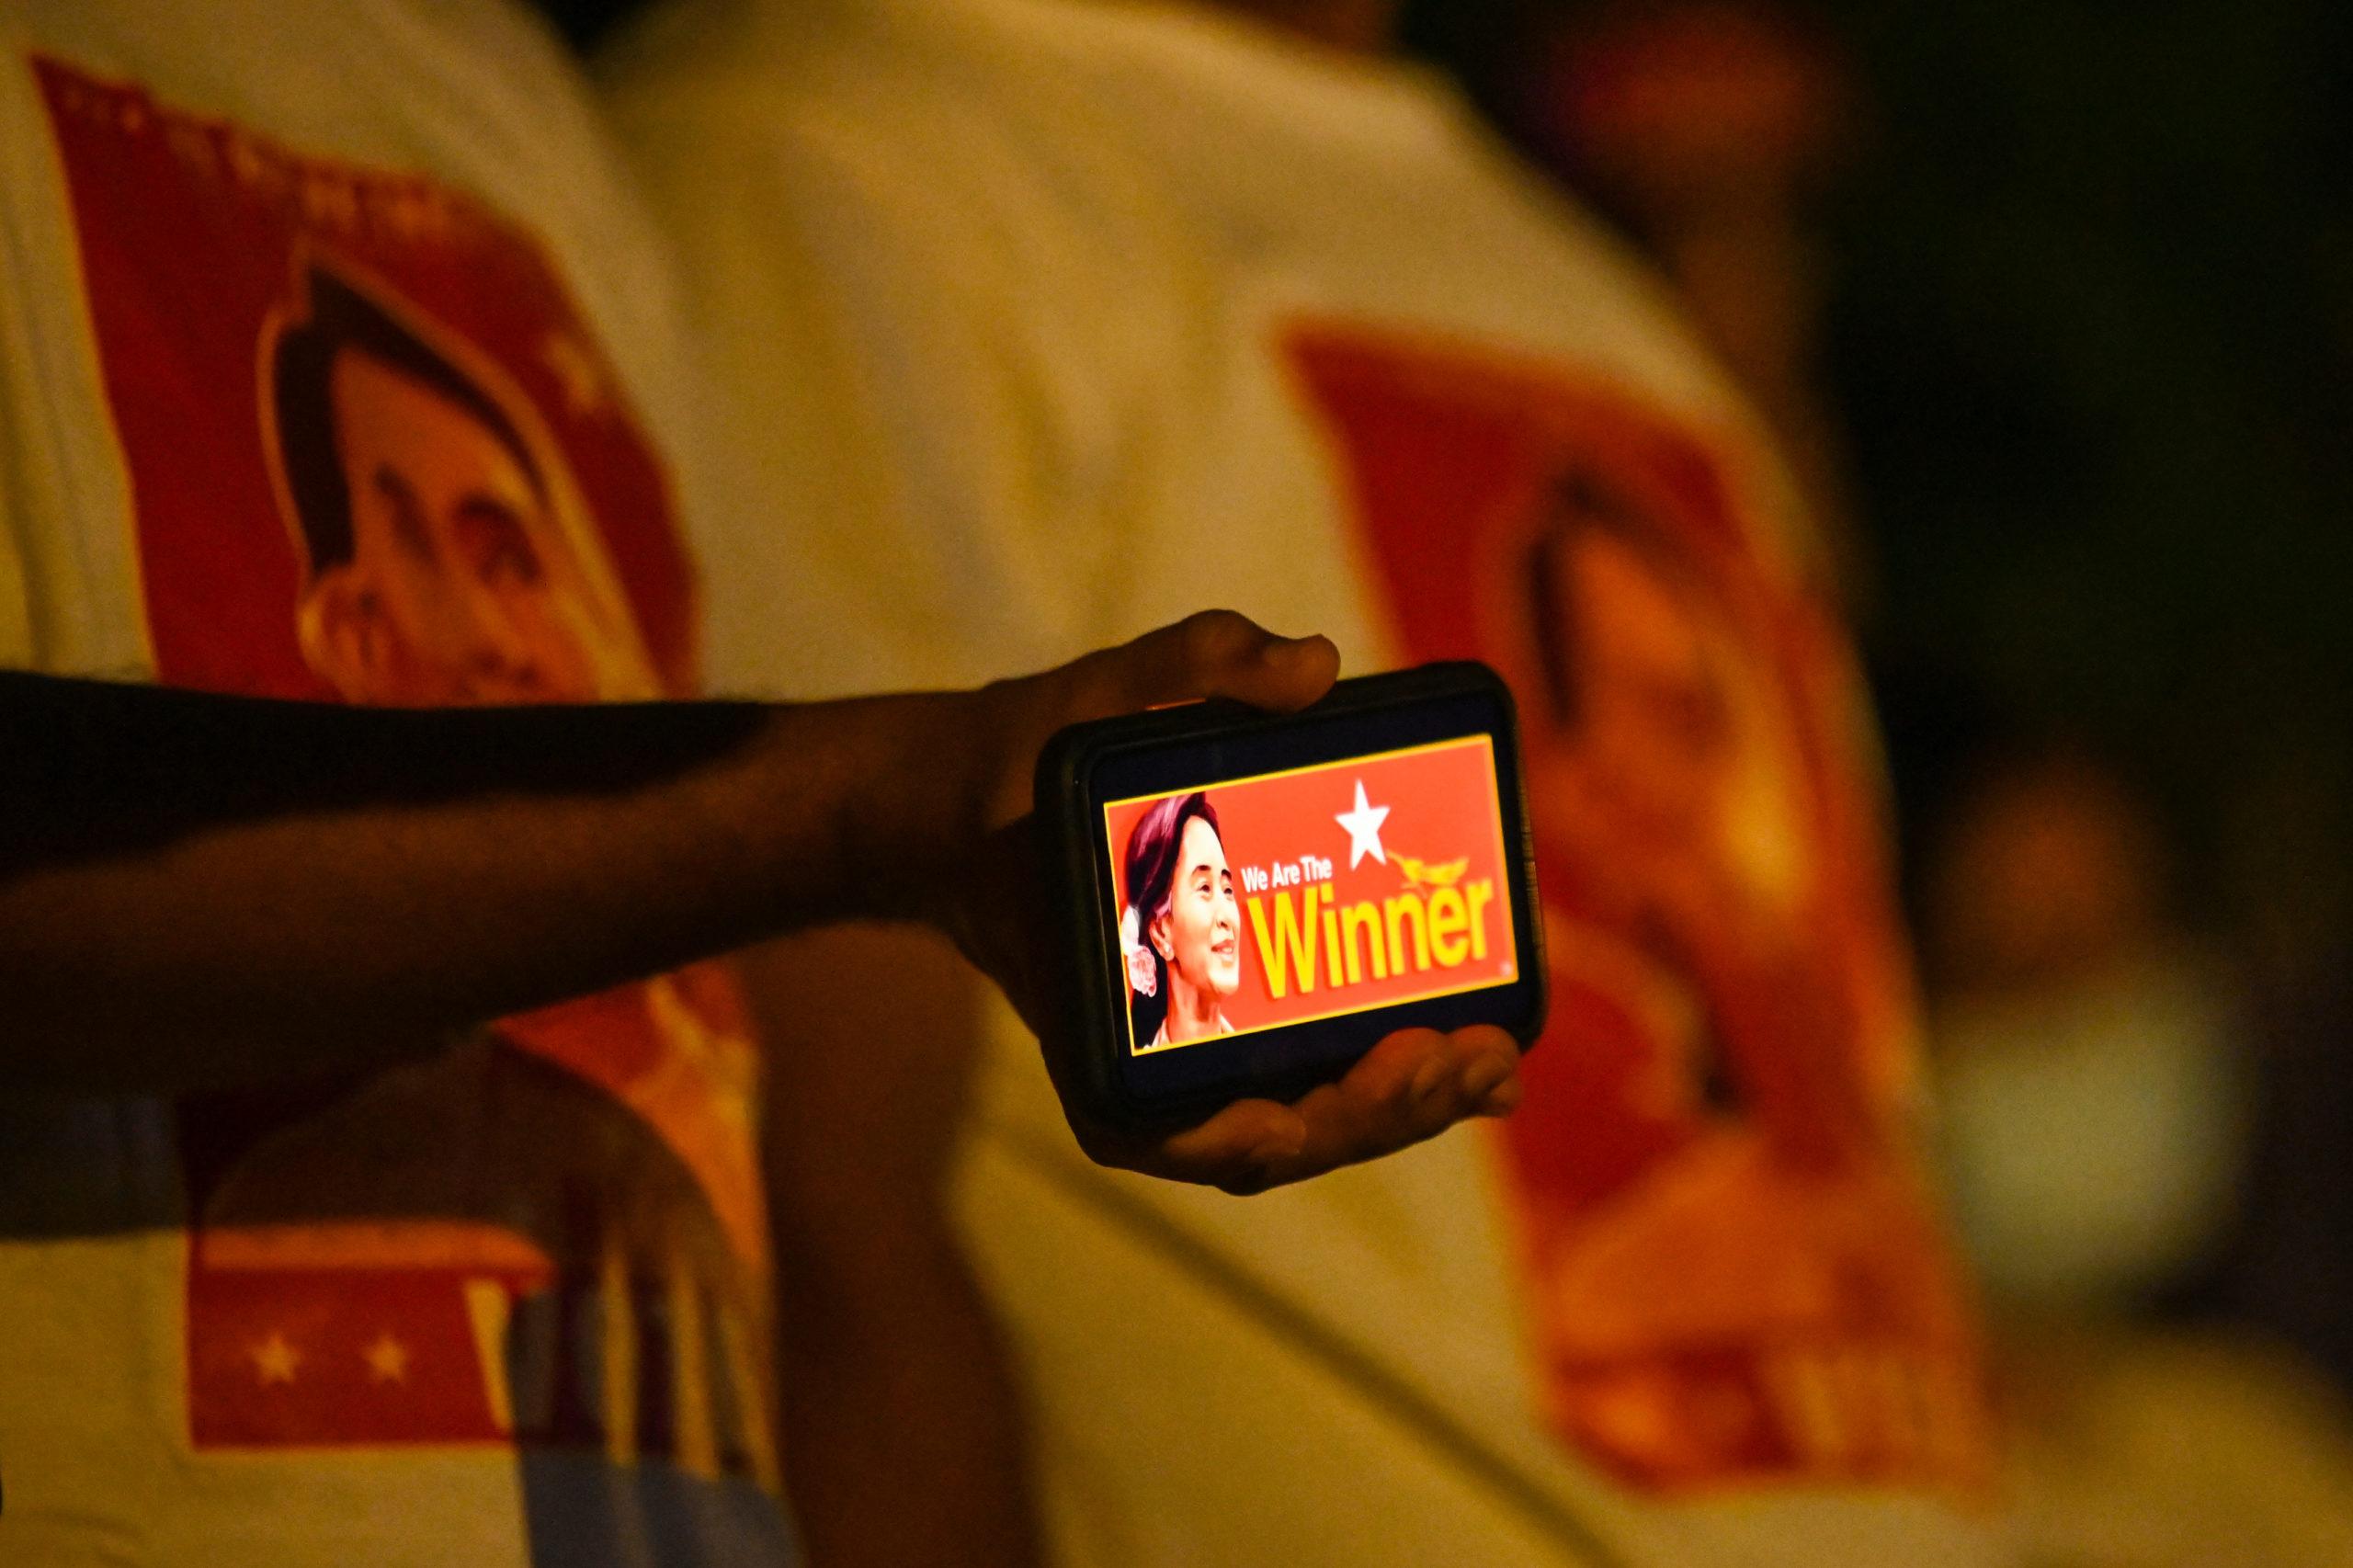 Suu Kyi's party says it won landslide victory in Myanmar polls